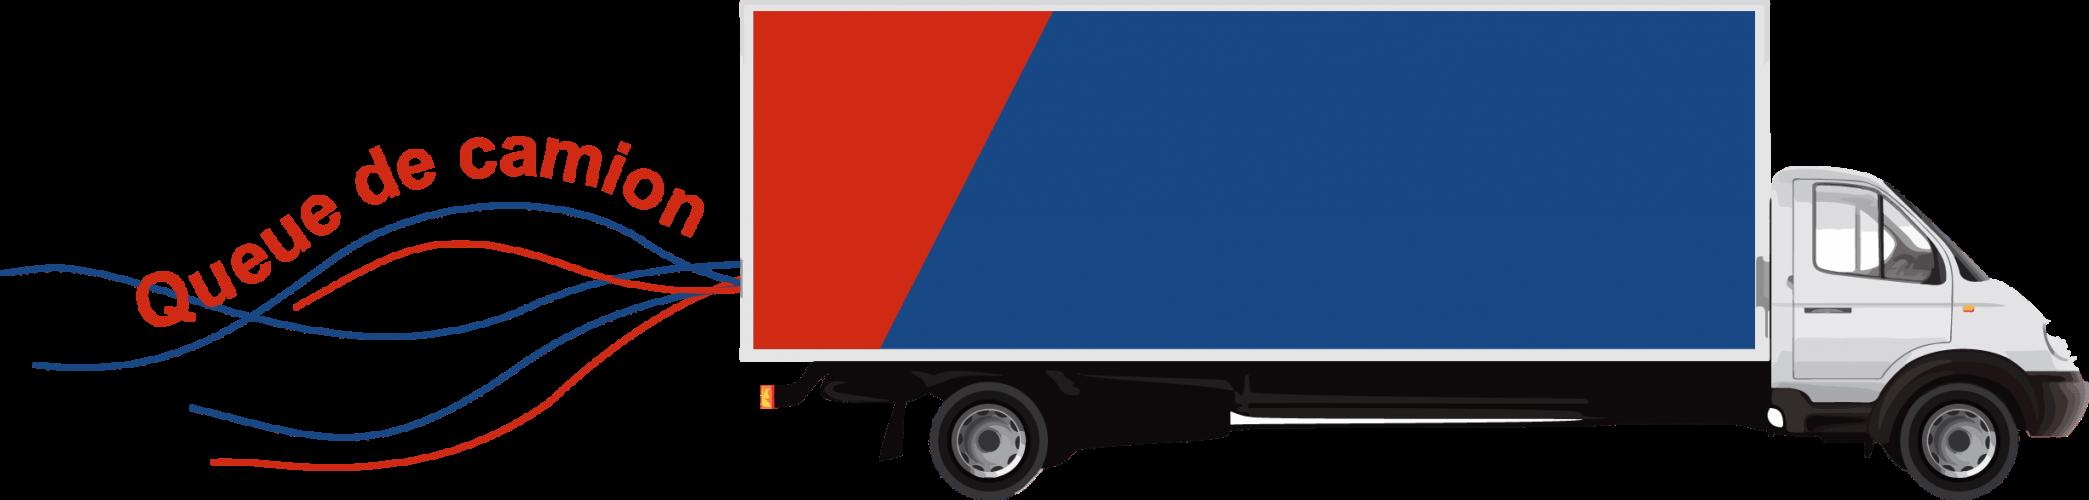 camion Que